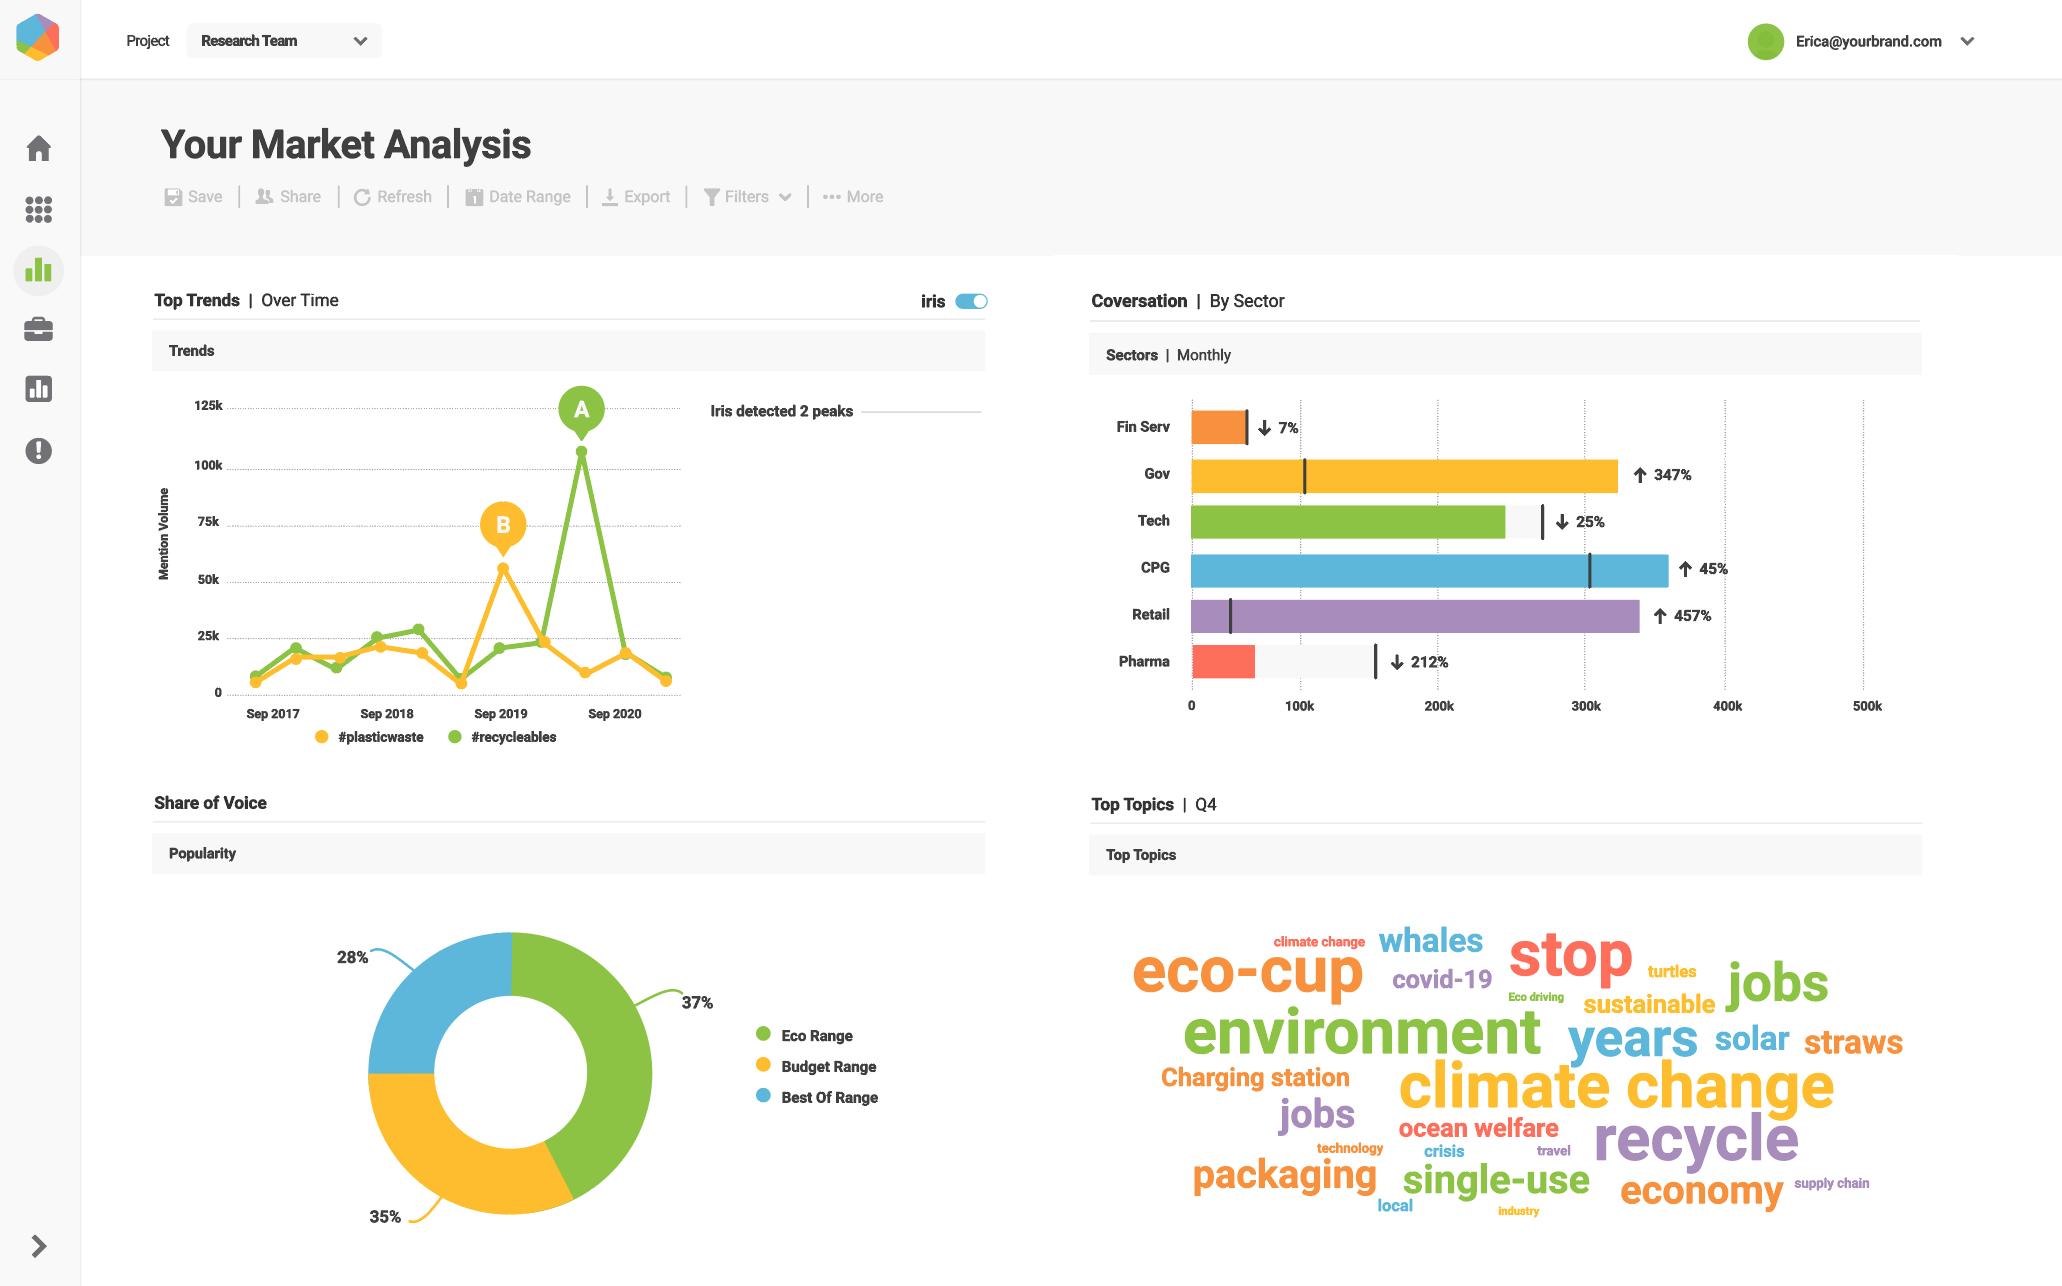 Screenshot of the premium media monitoring tool, Brandwatch